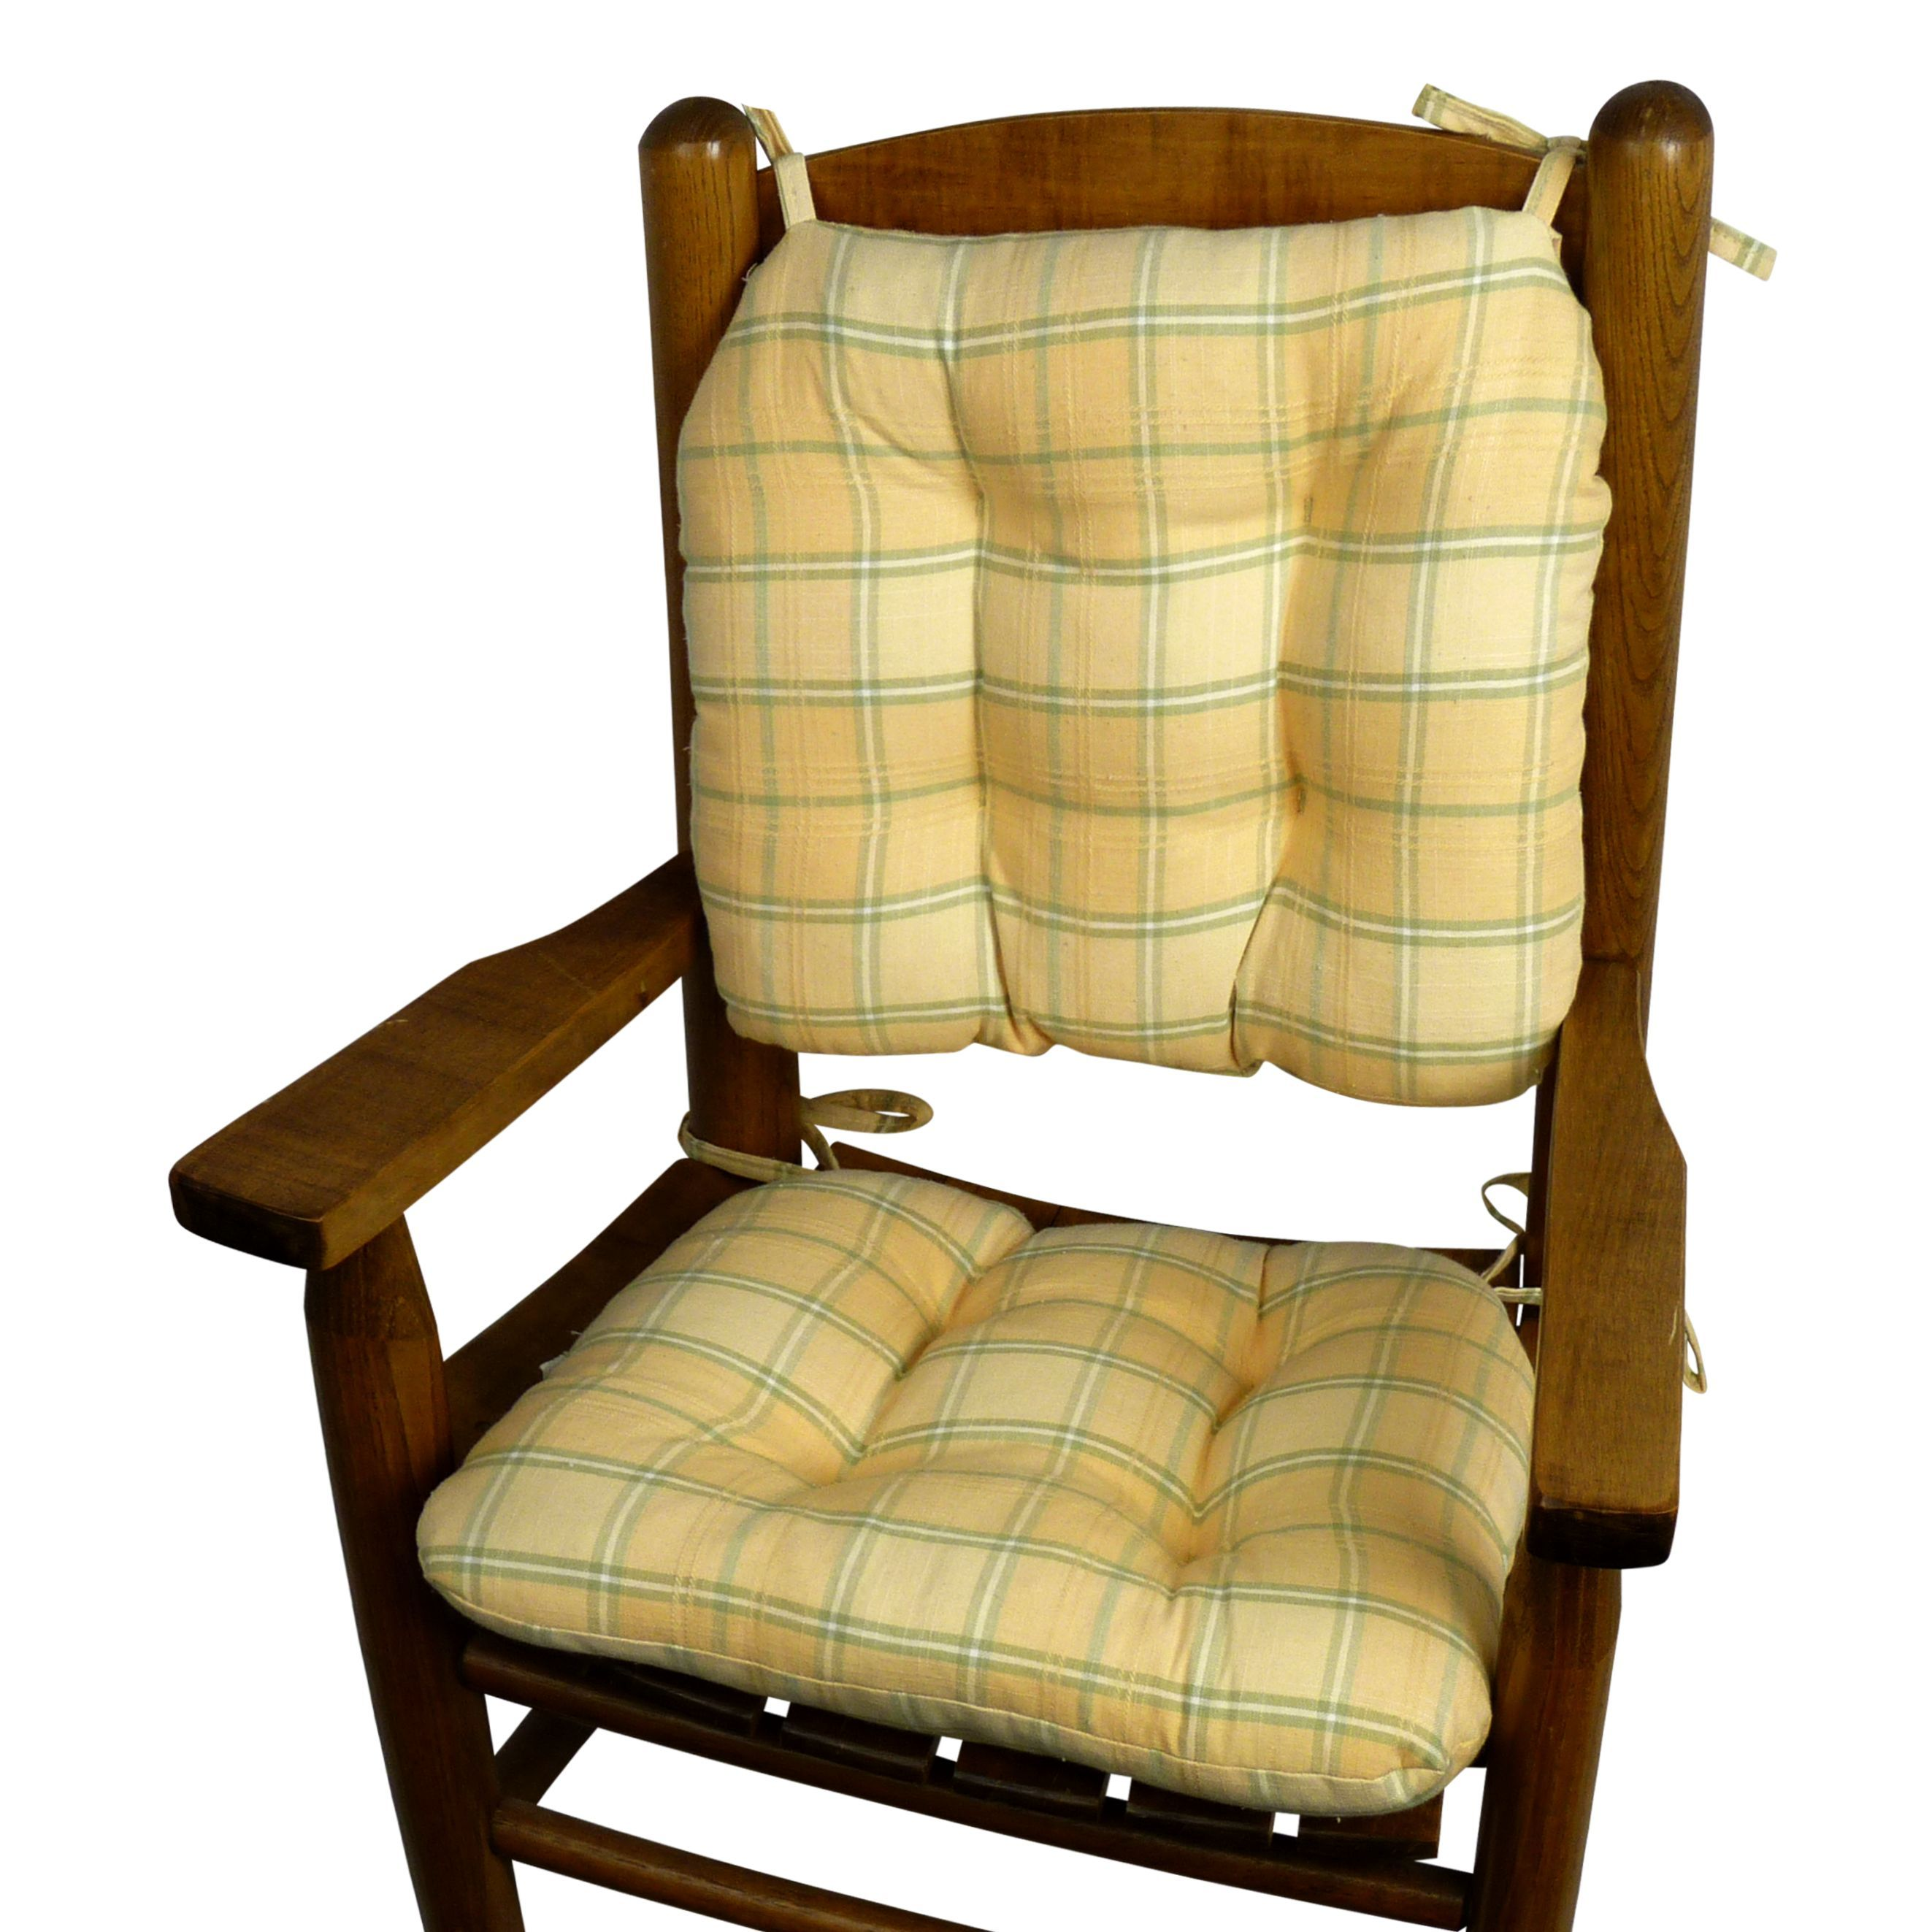 Child Rocking Chair Cushions   Morning Dew Yellow Plaid   Machine Washable